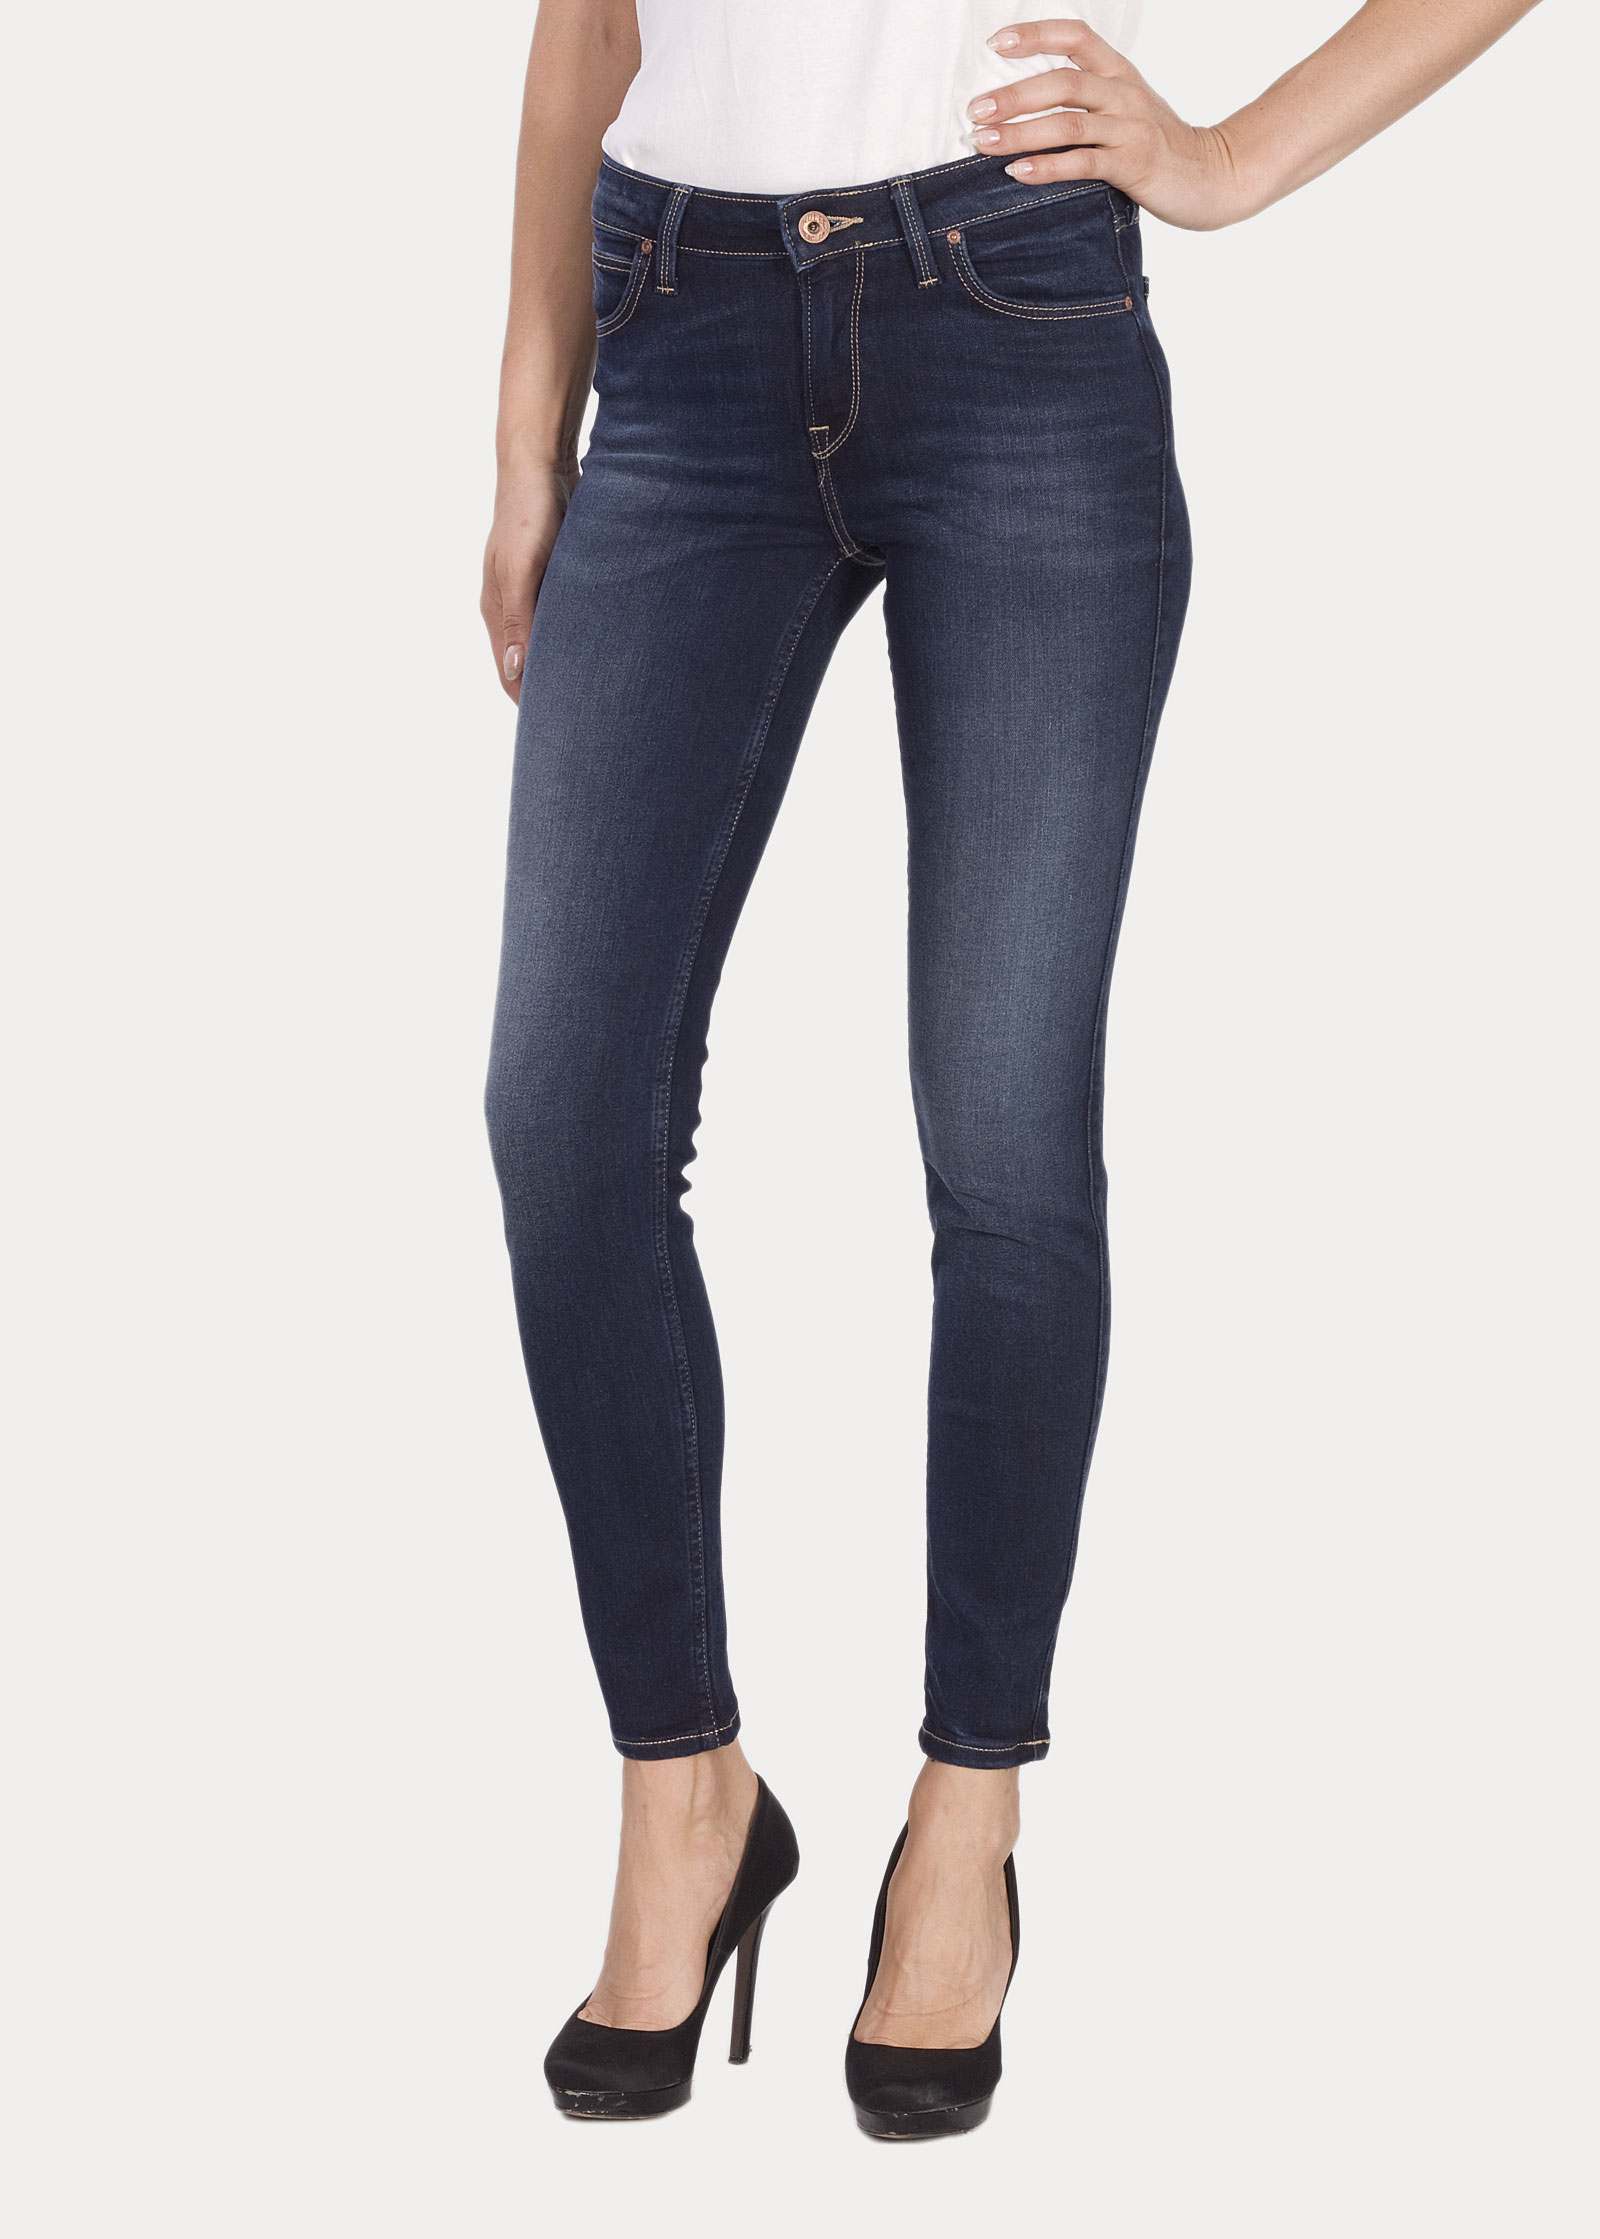 5a26ed362ec Woman s Jeans Lee® Scarlett - Night Porter (L526GCIU) - Jeans24h ...